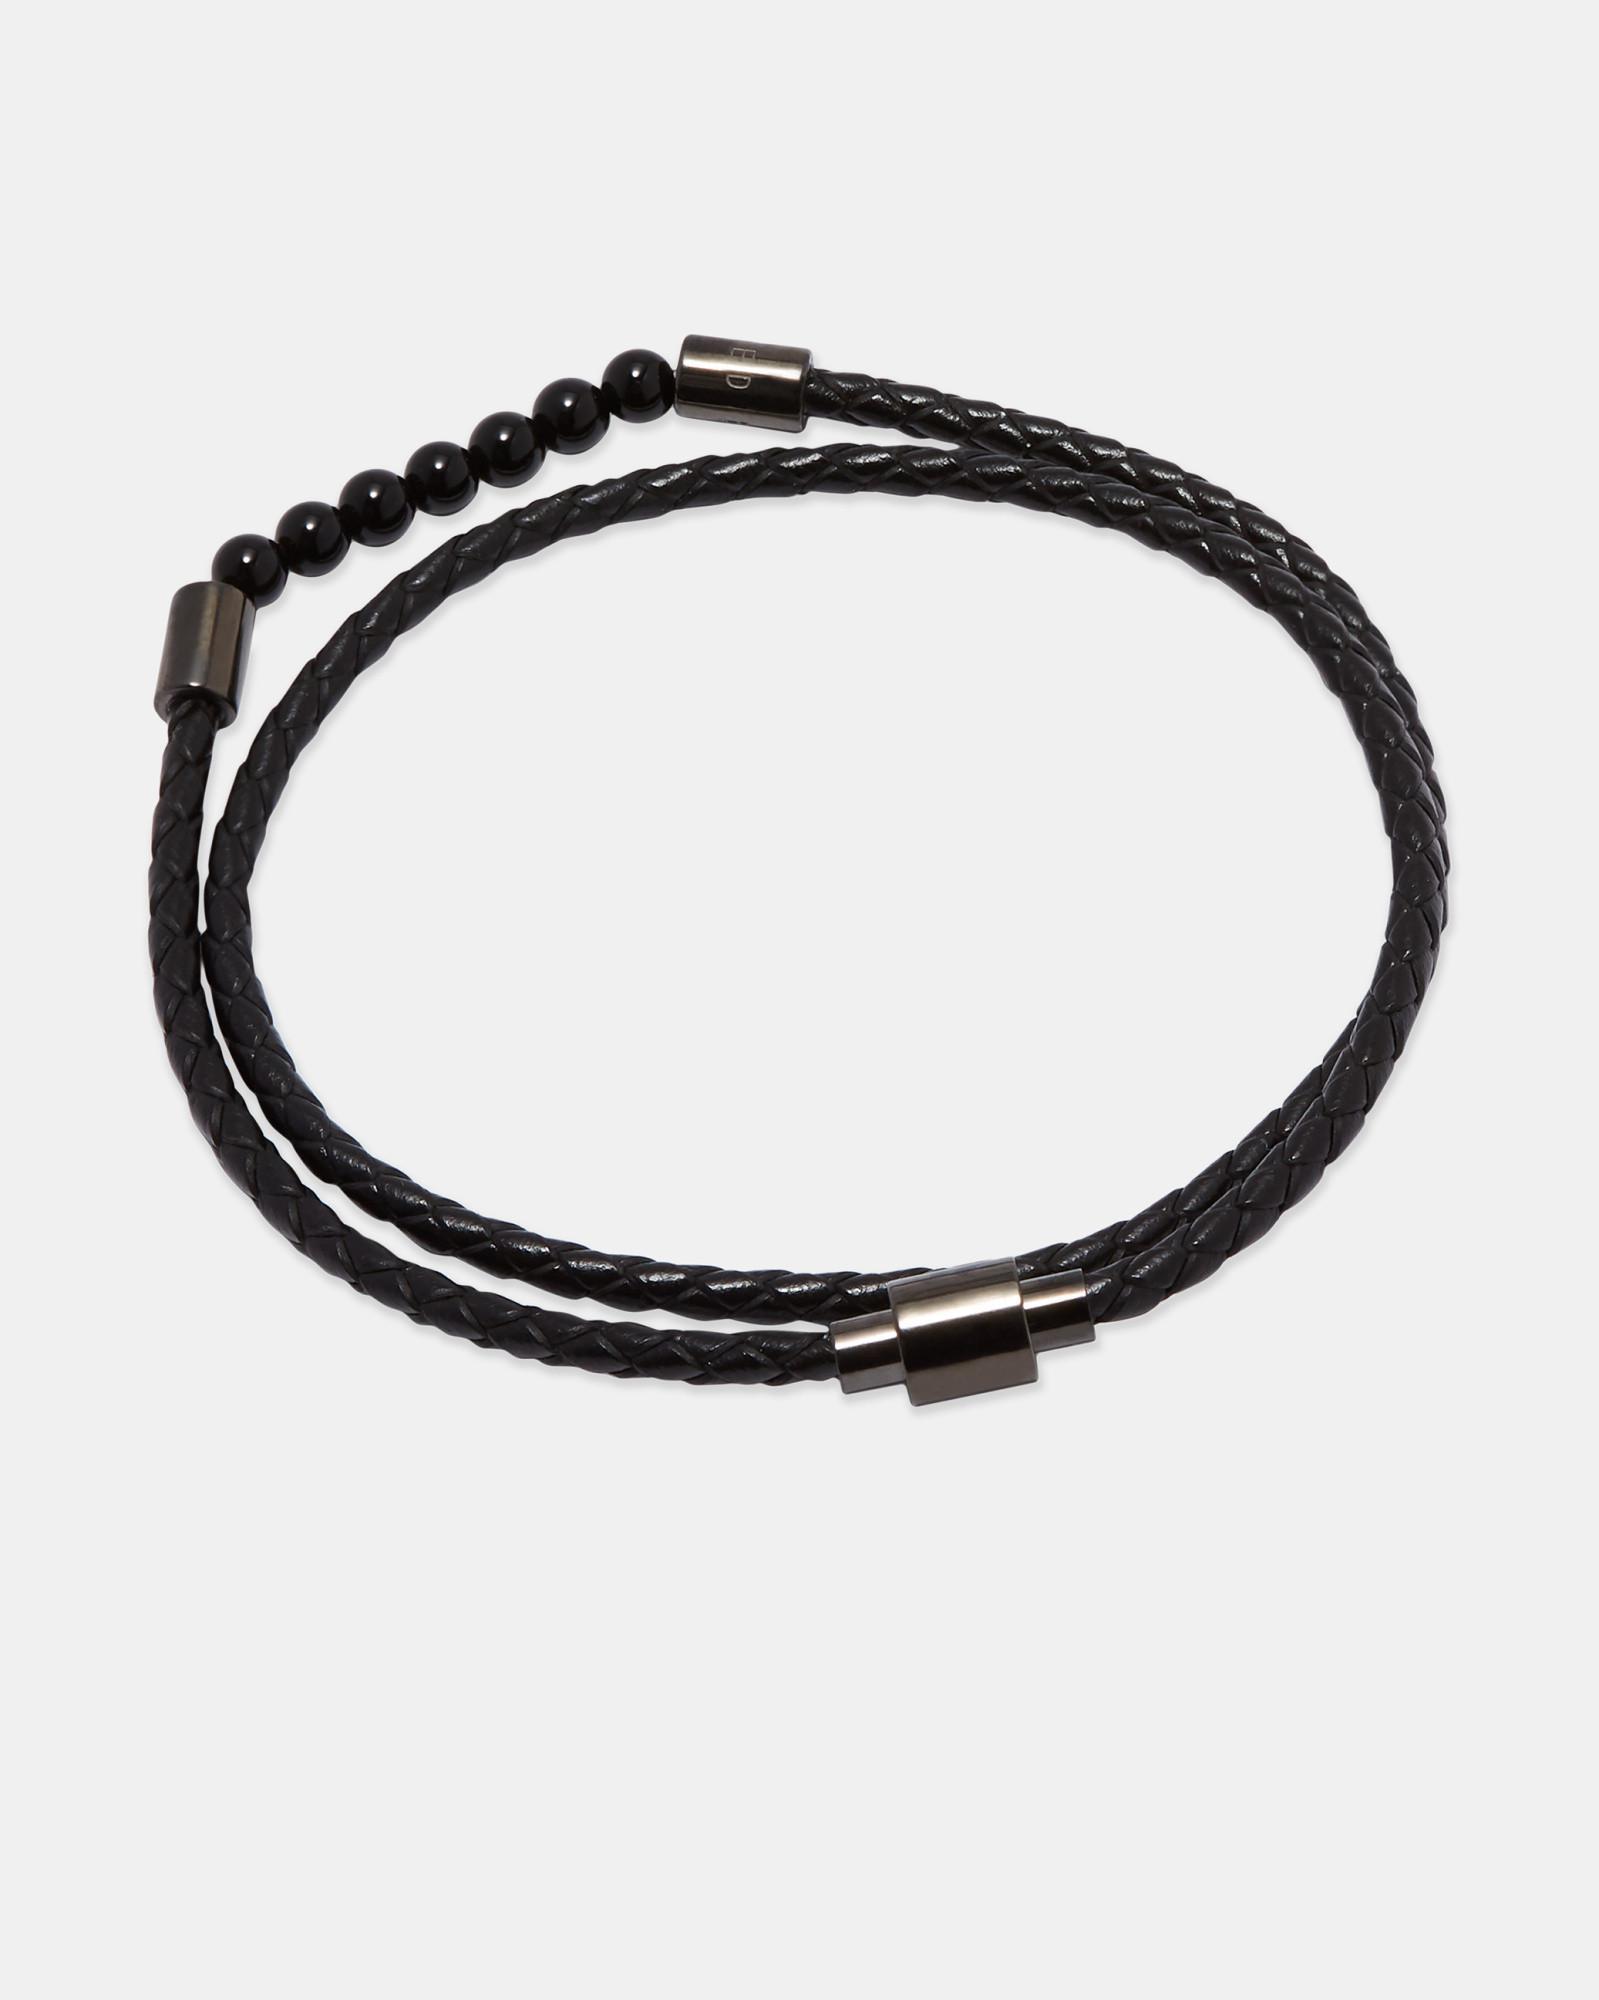 8057407f8 Lyst - Ted Baker Beaded Leather Double Wrap Bracelet in Black for Men